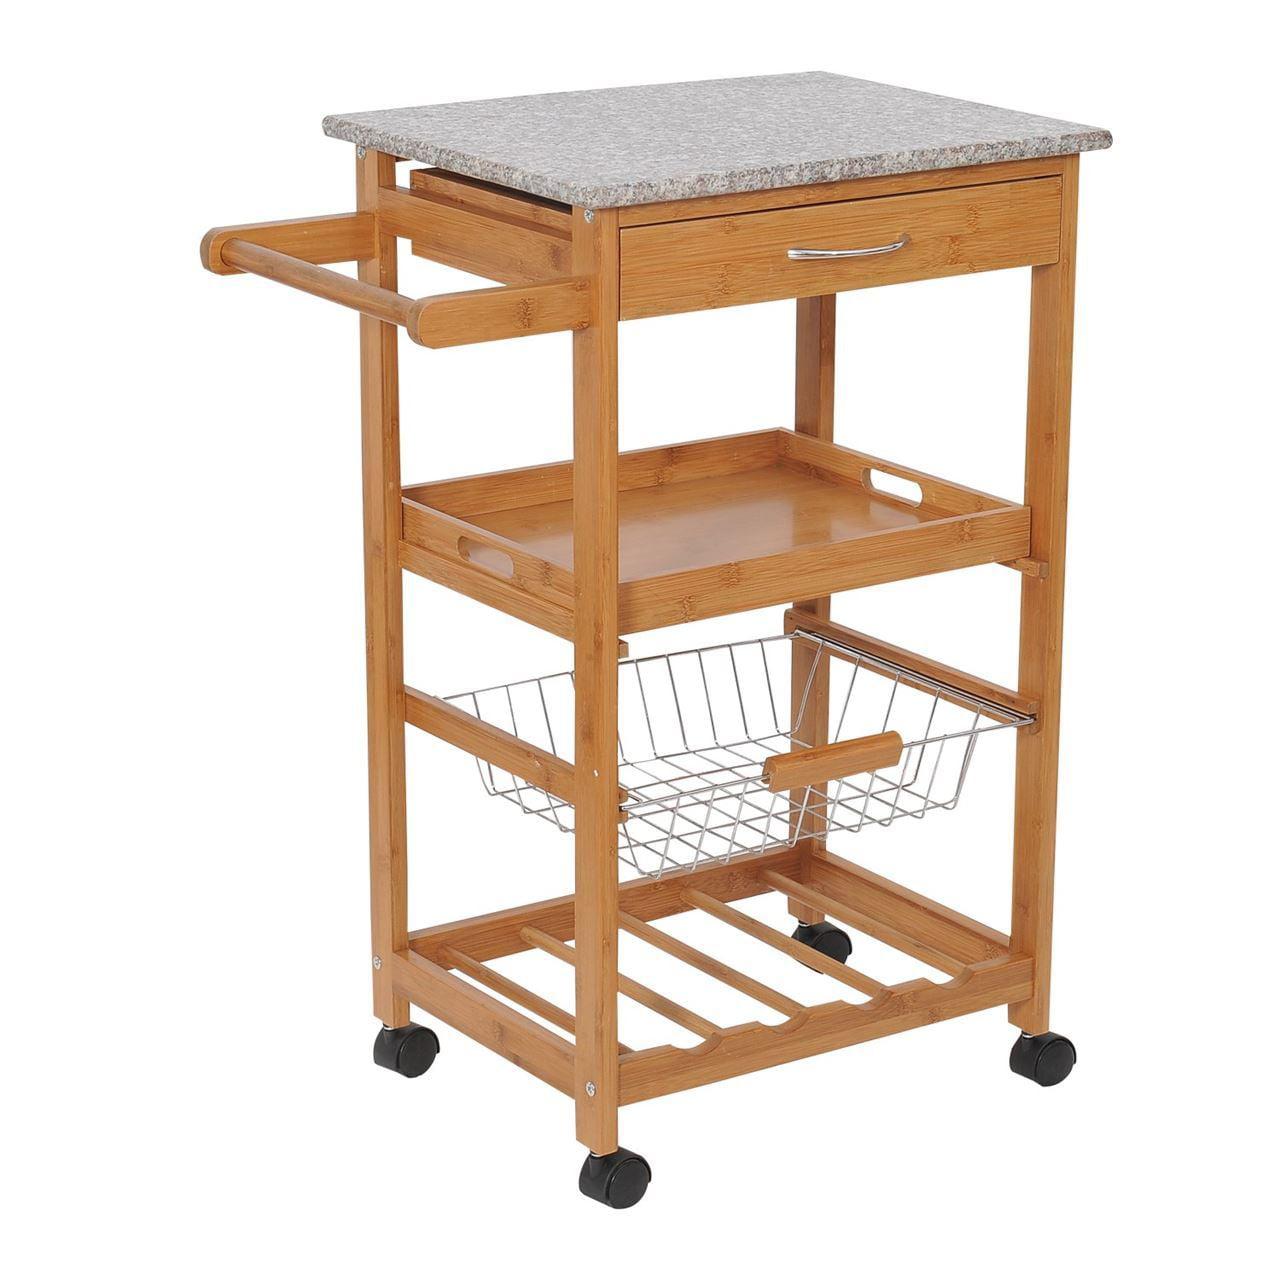 Wooden Kitchen Trolley Cart with Wine Rack – Granite Top